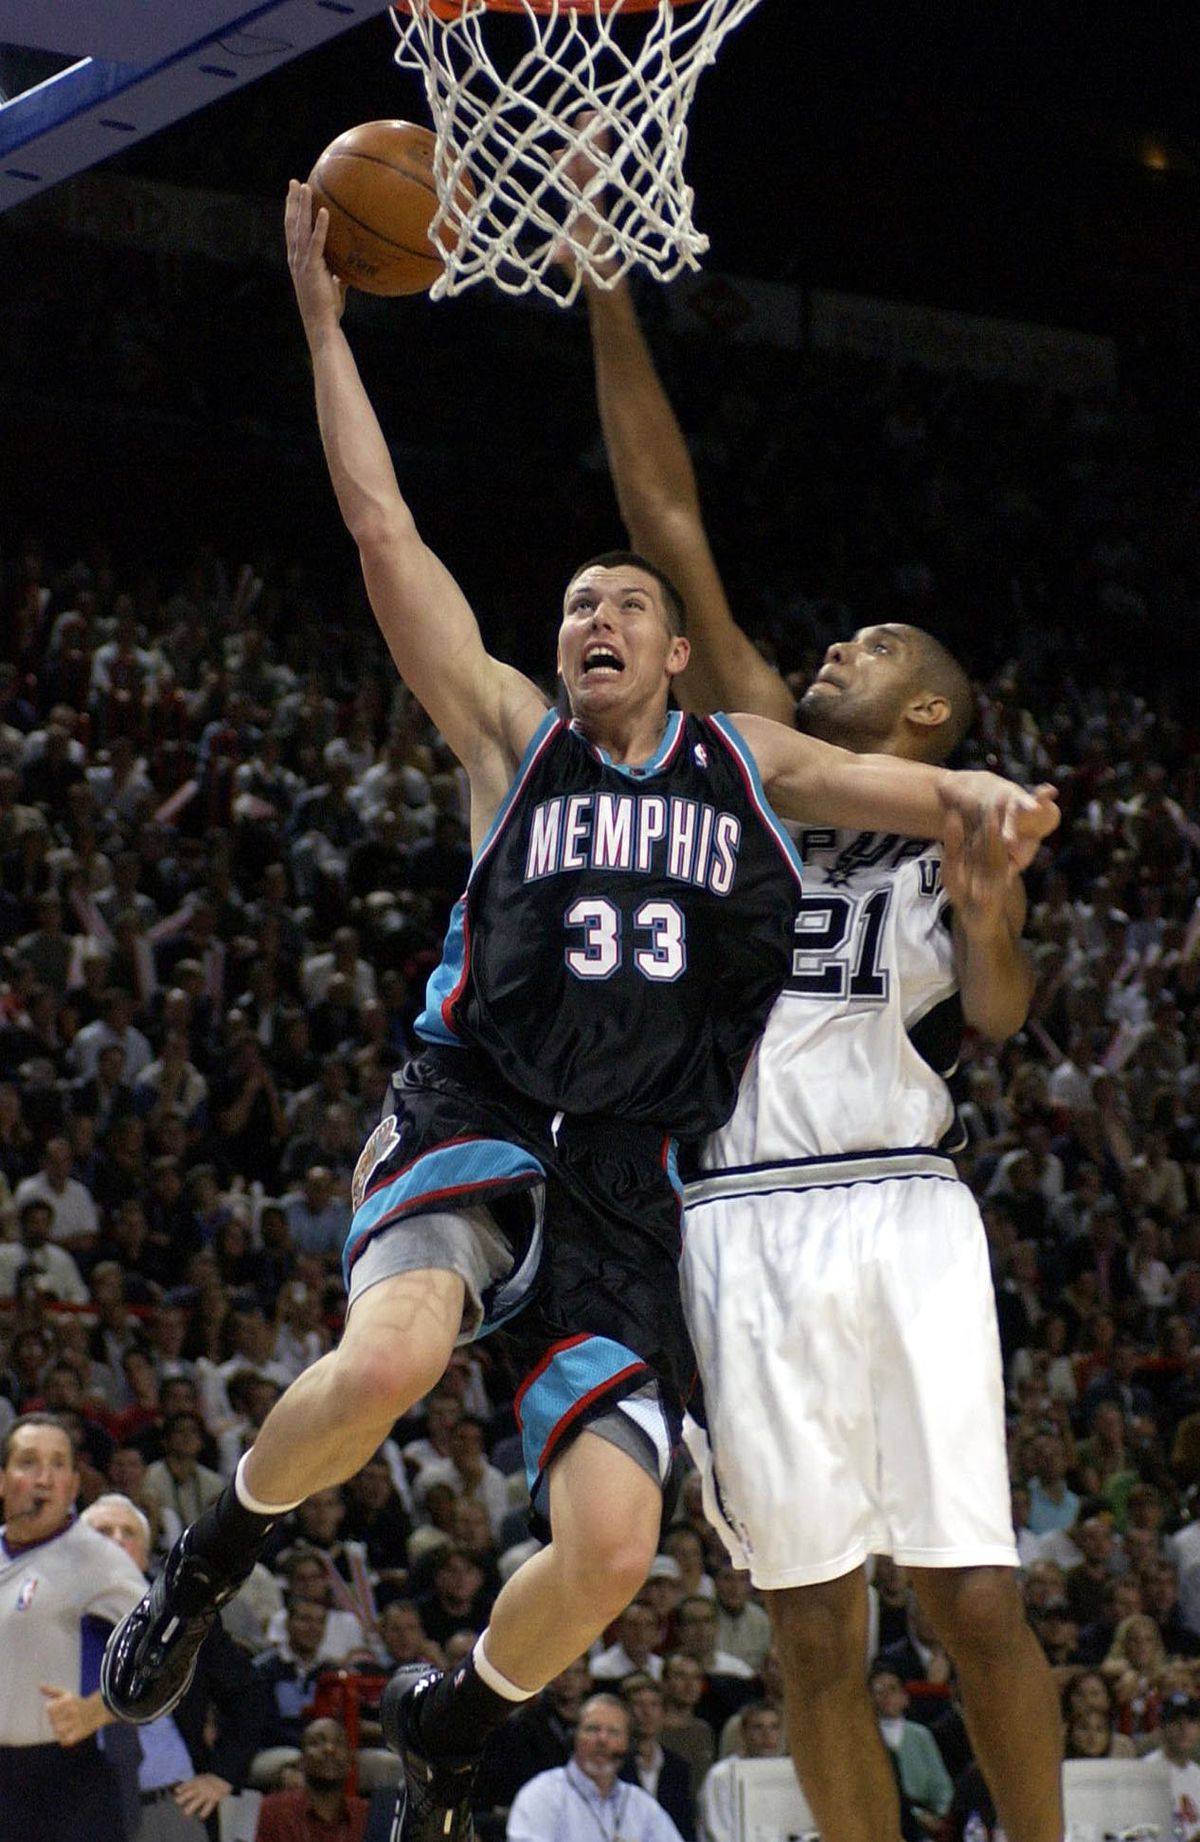 NBA Europe Games 2003 : San Antonio Spurs vs Memphis Grizzlies